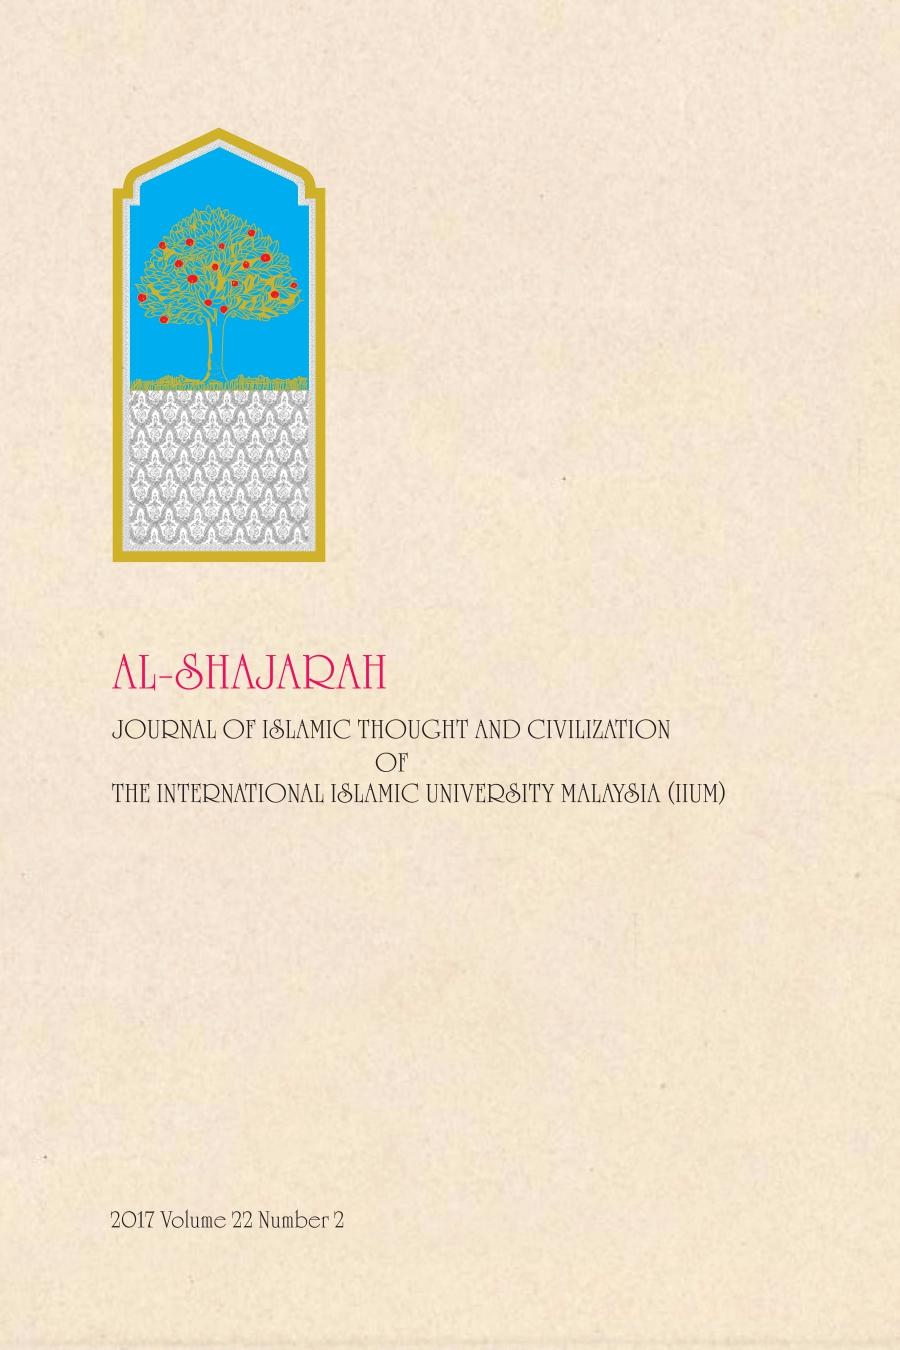 "Homam Altabaa, Spirituality in Modern Literature: Kahlil Gibran and the Spiritual Quest, ""Al-Shajarah"", The International Islamic University Malaysia (IIUM), Vol. 22, No. 2, 2017, pp. 215-236."